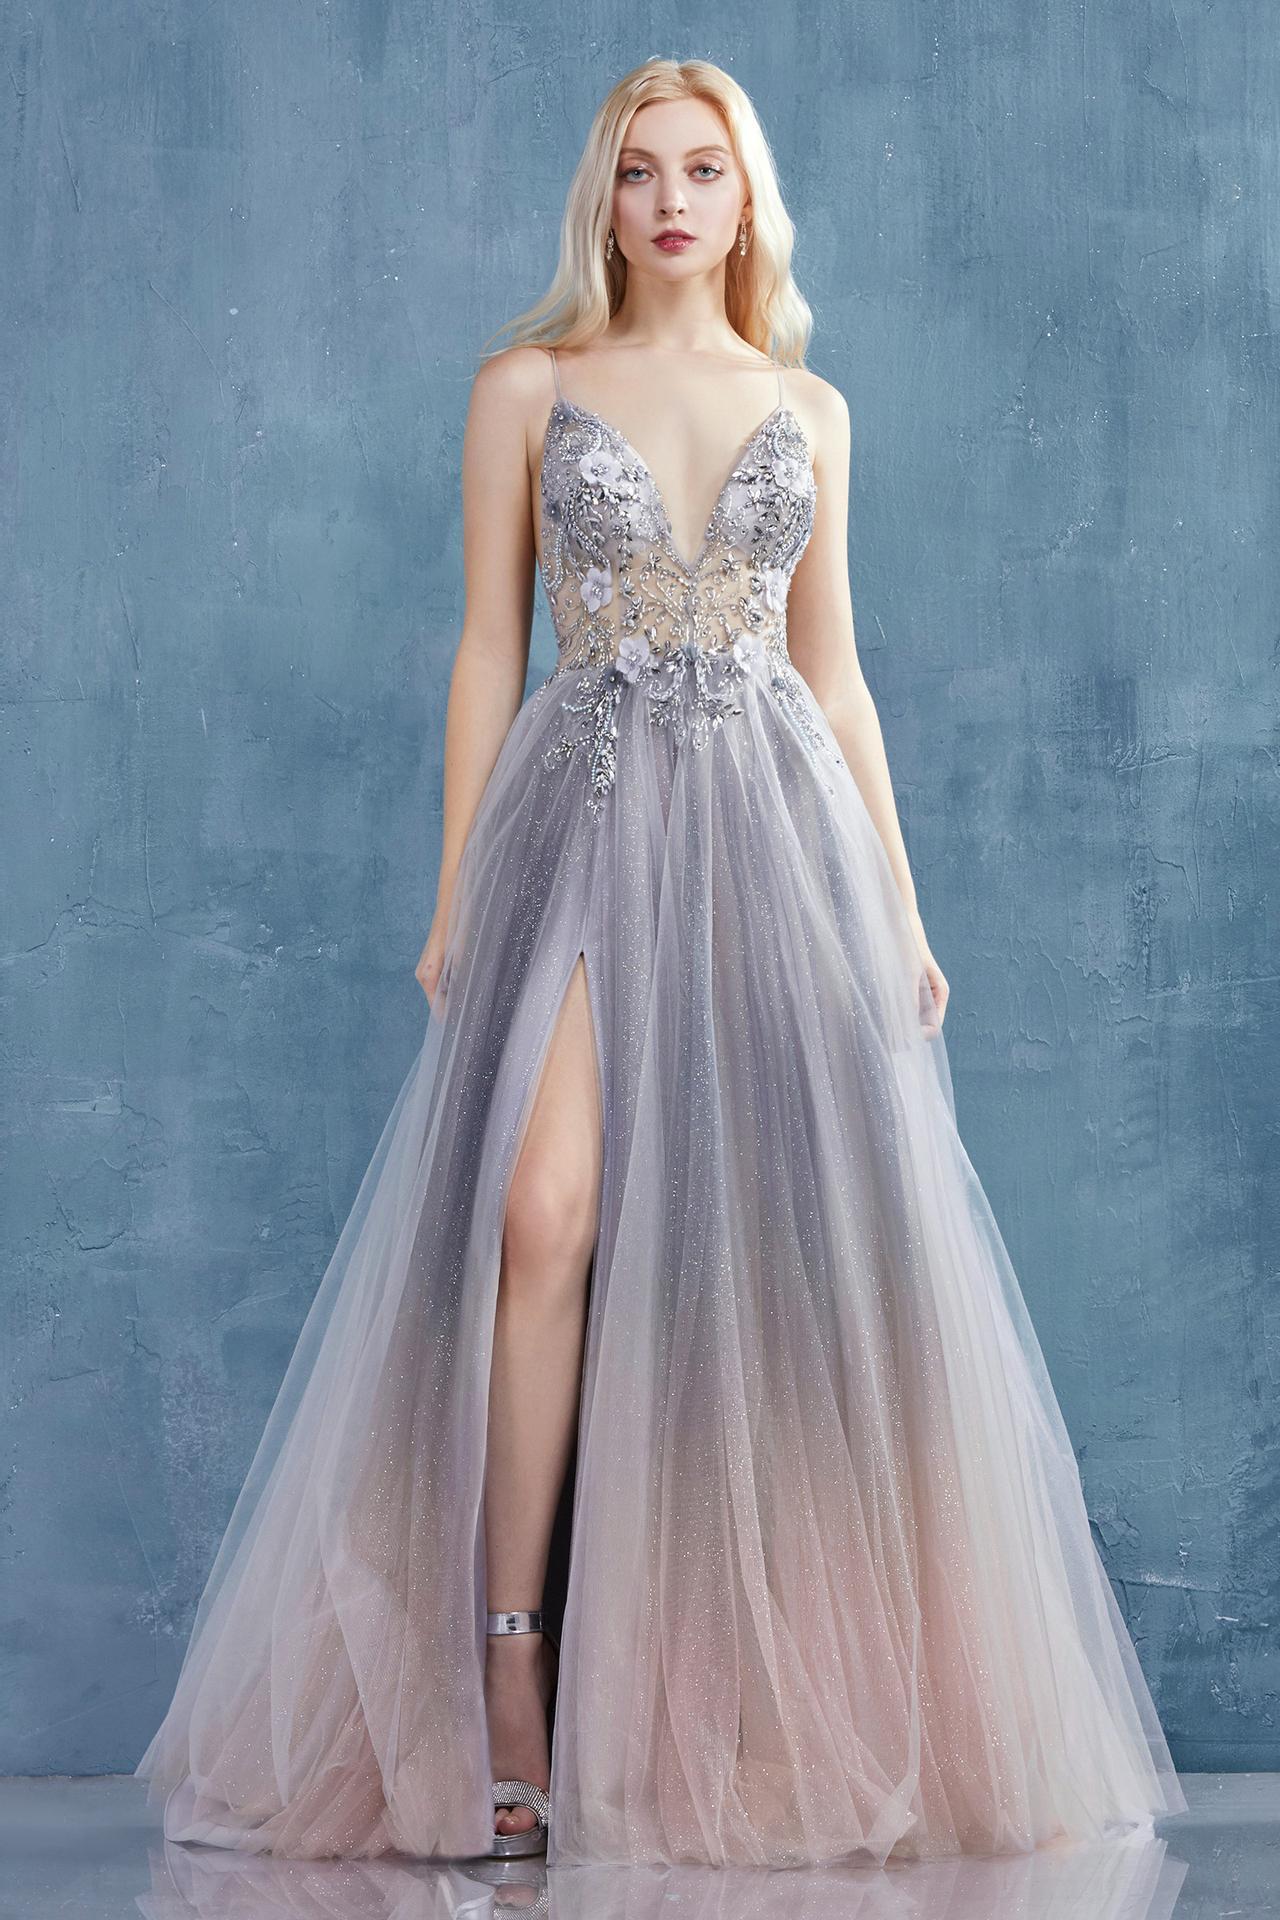 Nové spoločenské šaty :) - Obrázok č. 43